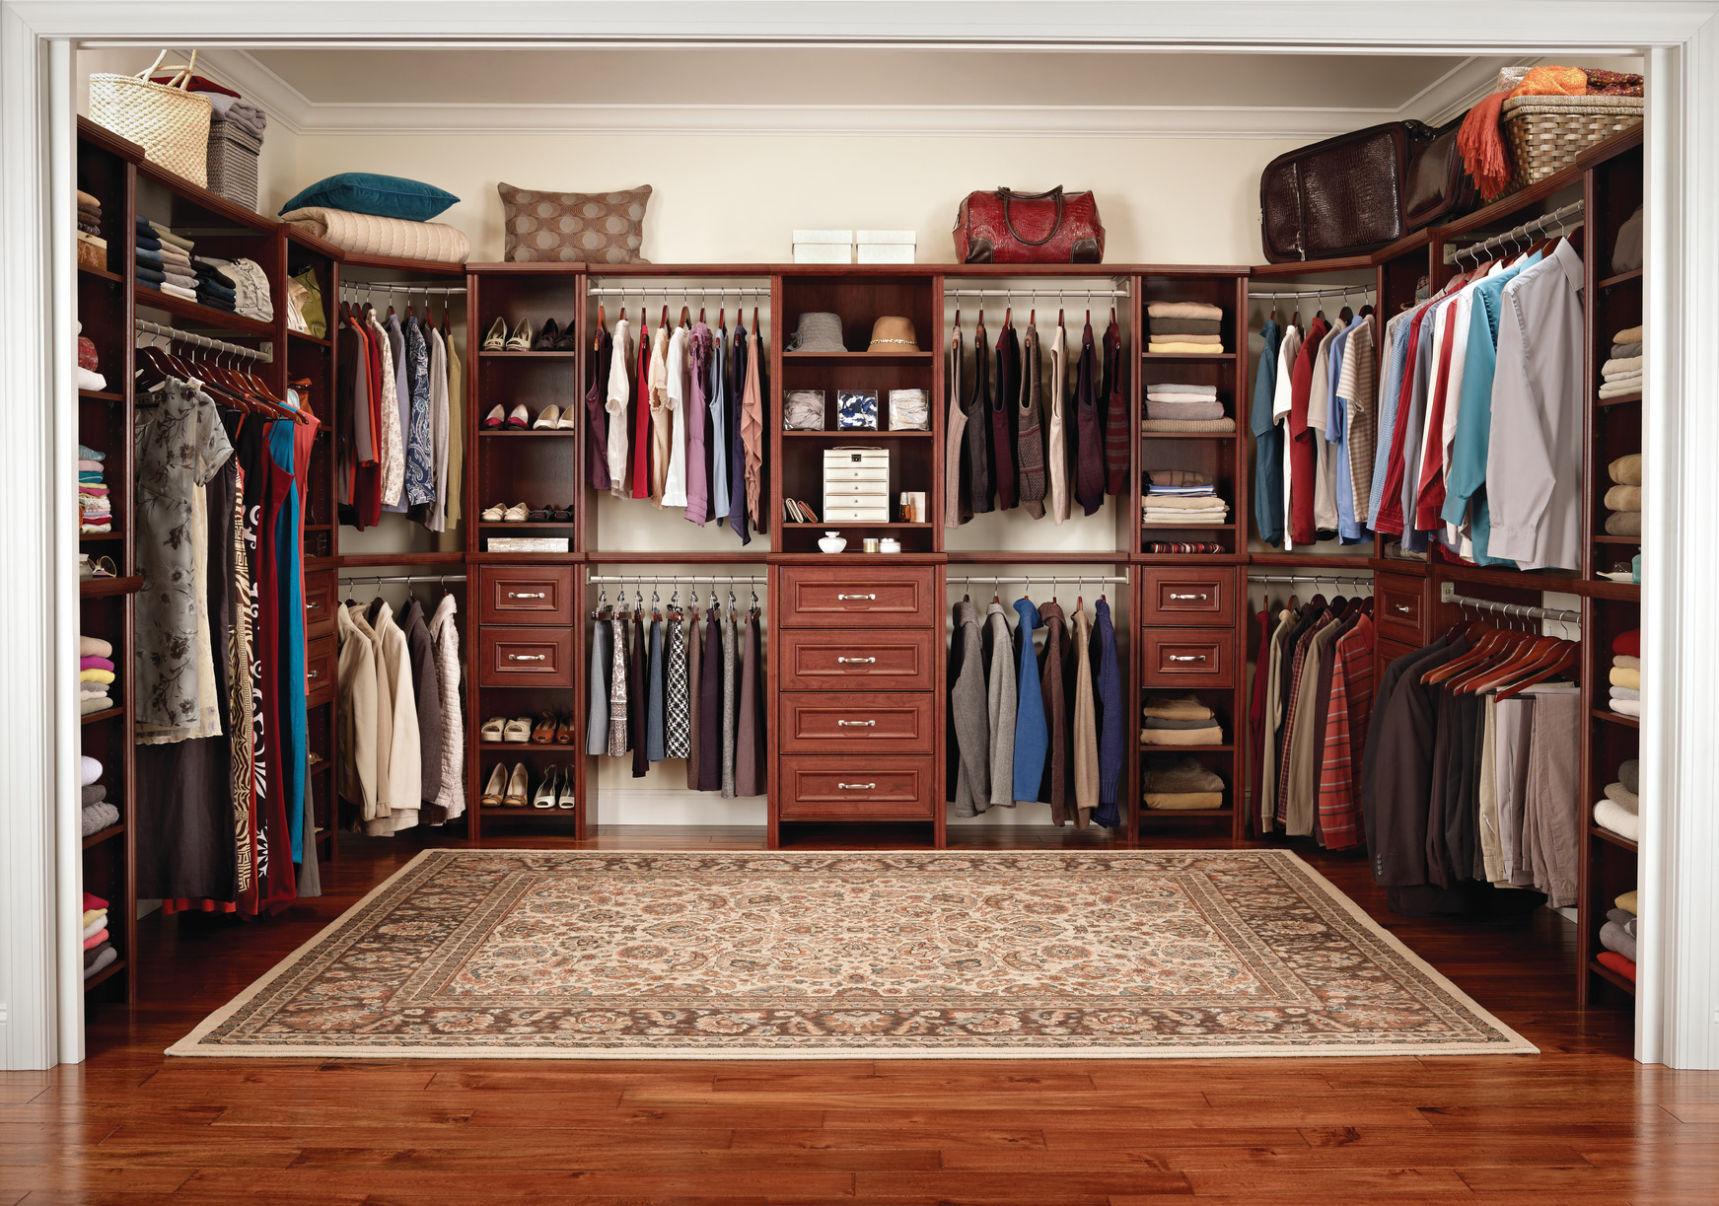 Lovely How To Convert A Spare Room Into A Dream Closet | Lifestyles |  Lacrossetribune.com